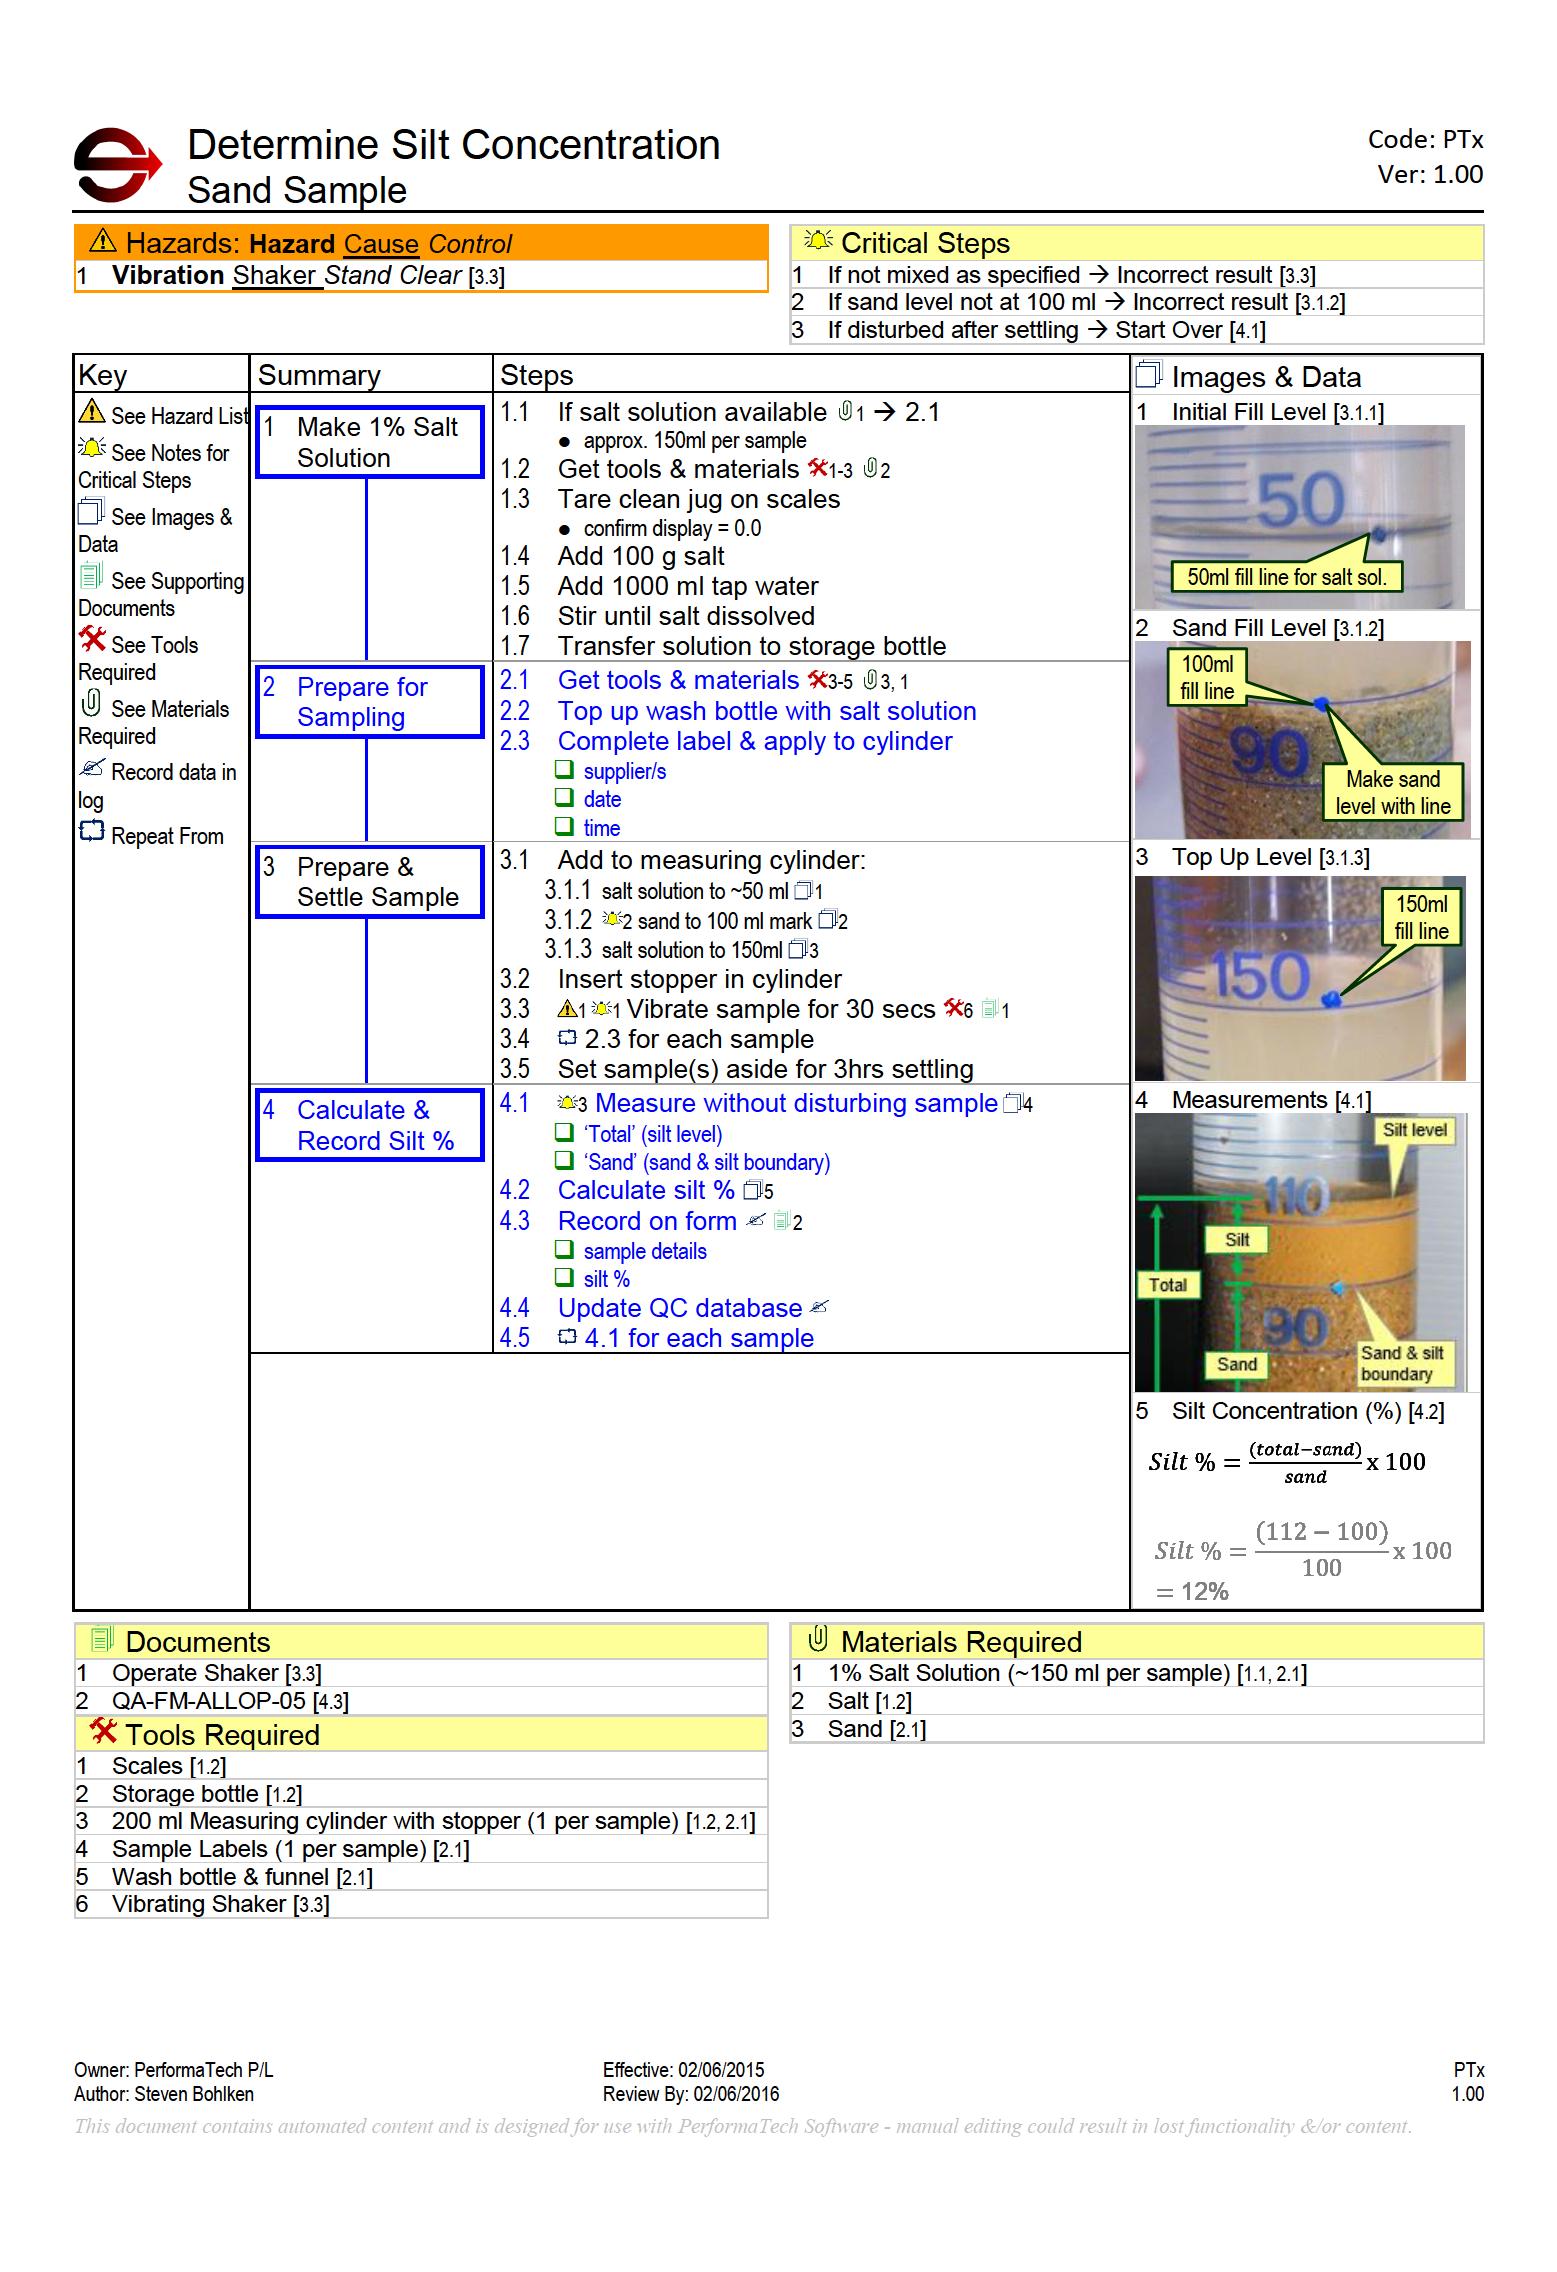 Example standard operating procedure sop performatech example of a standard operating procedures developed using trim sop altavistaventures Choice Image